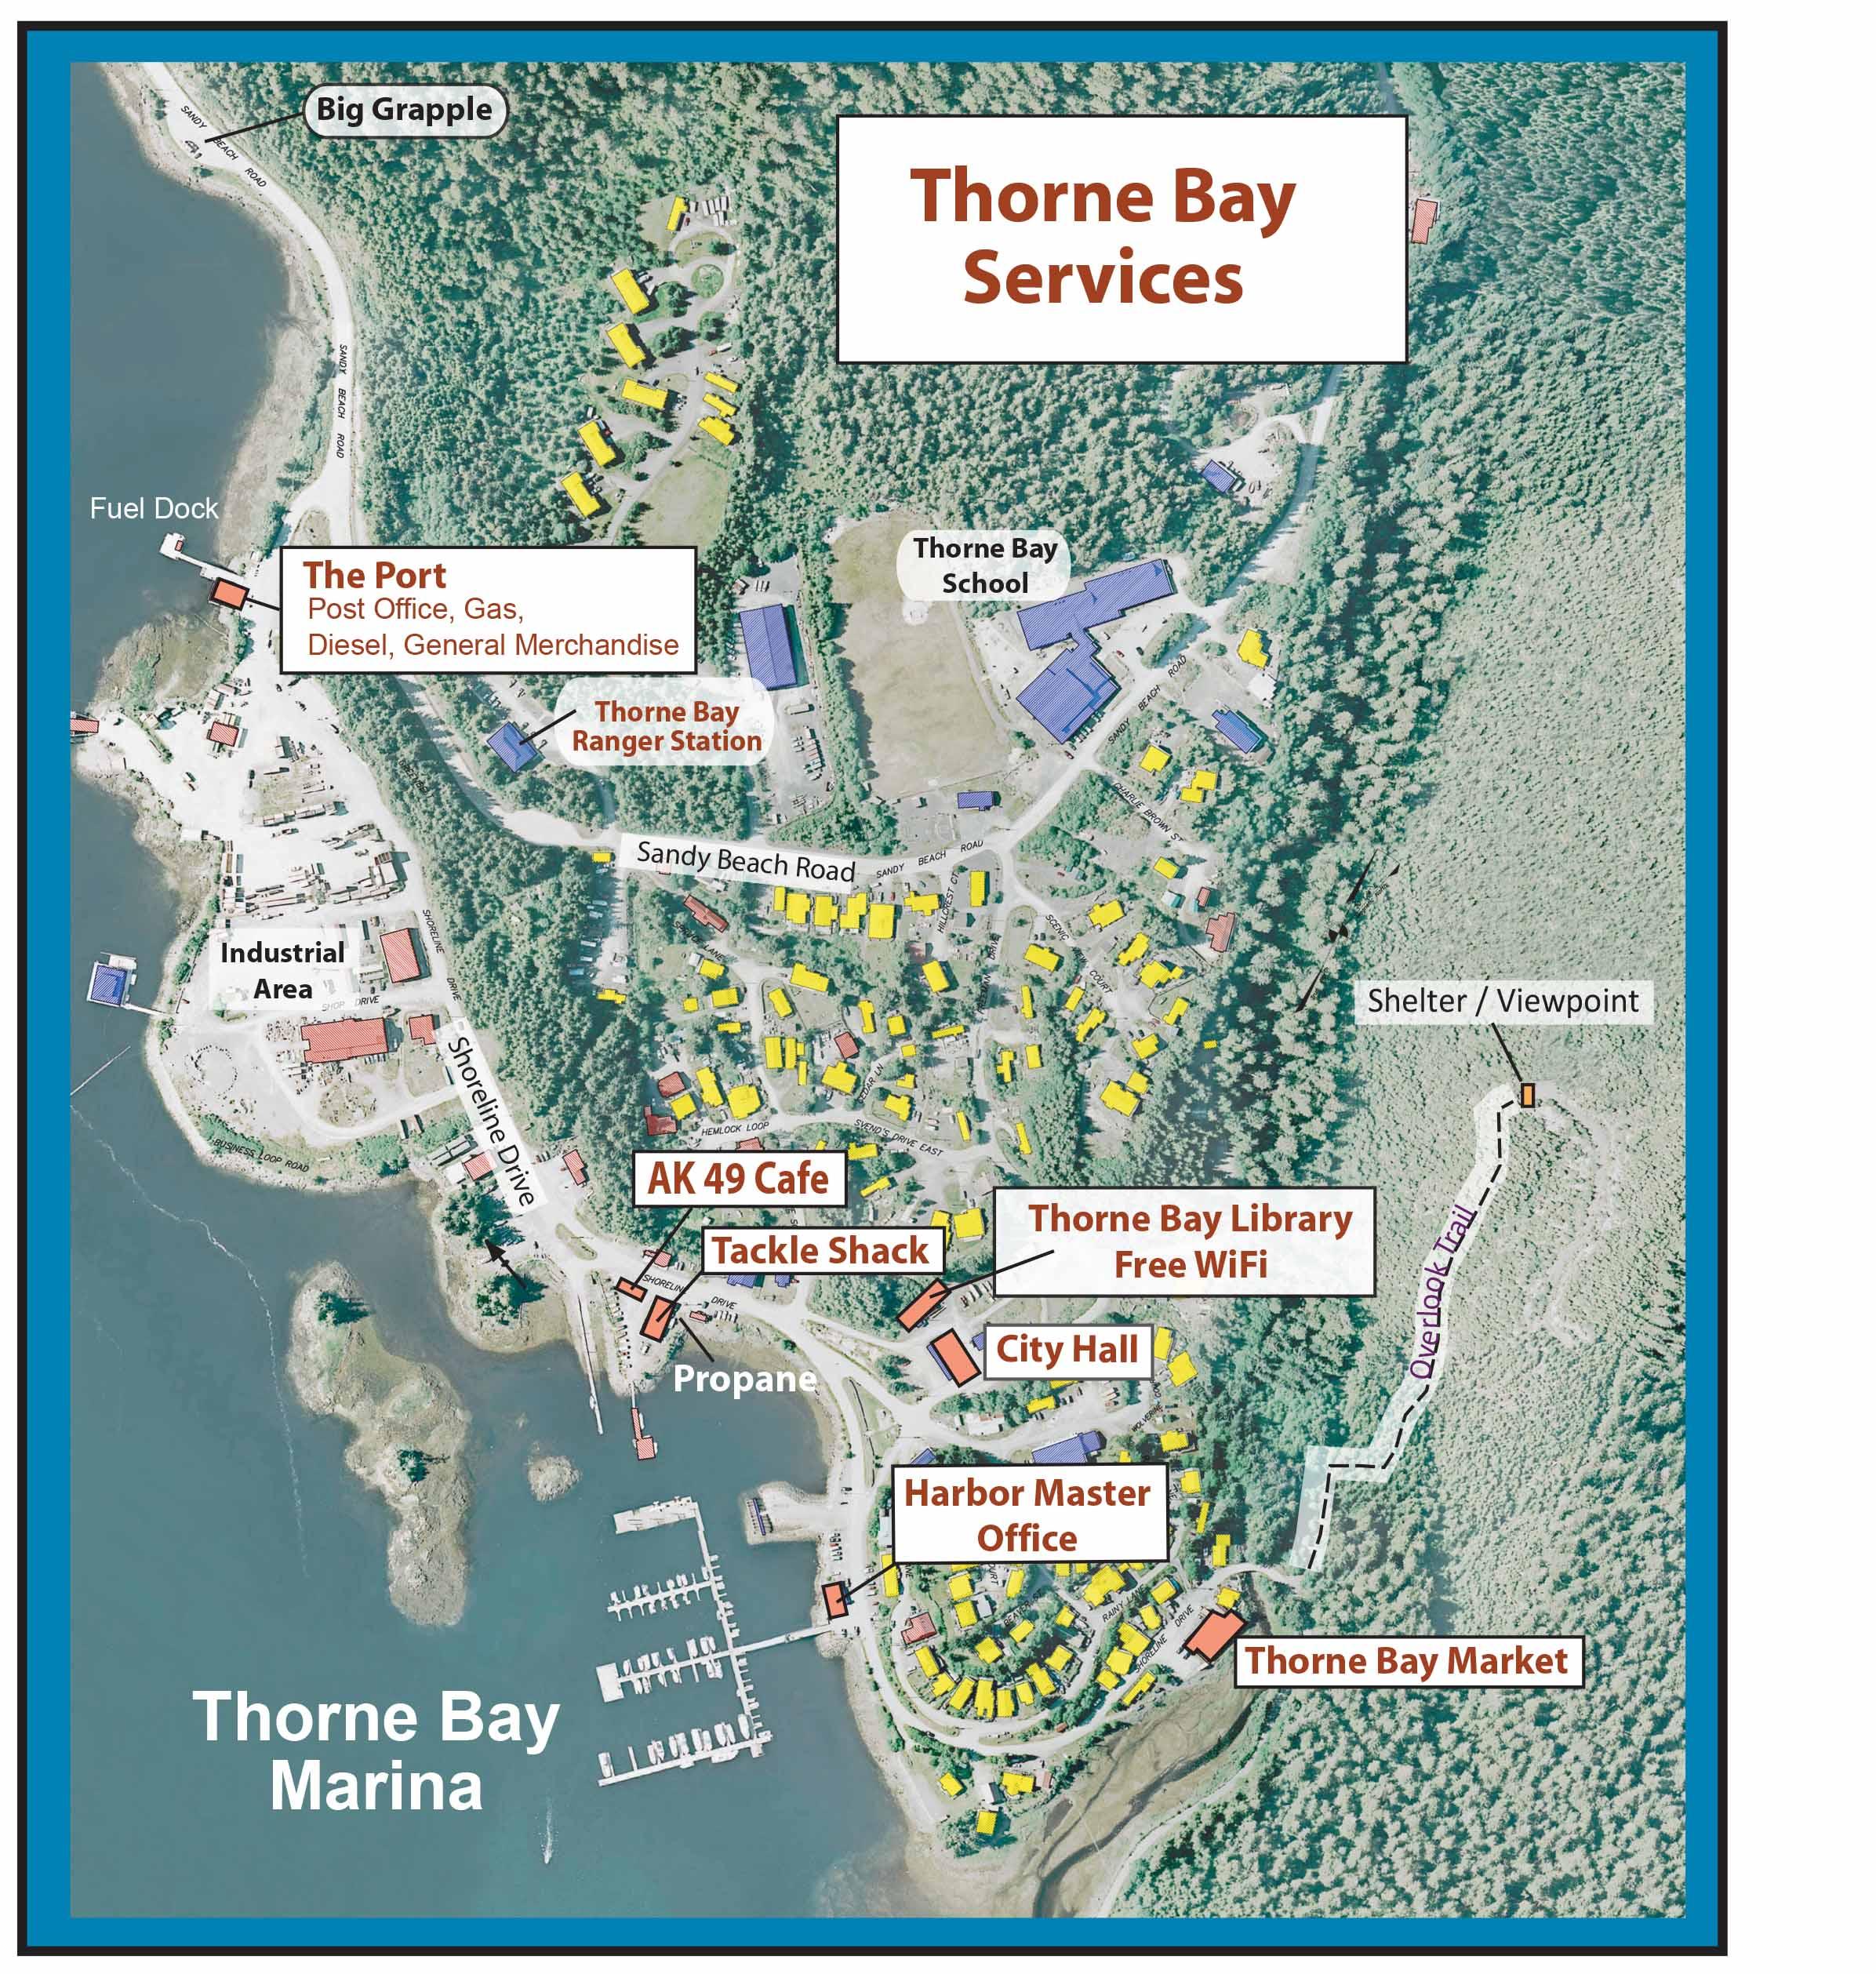 thorne bay alaska map Thorne Bay Services Map City Of Thorne Bay